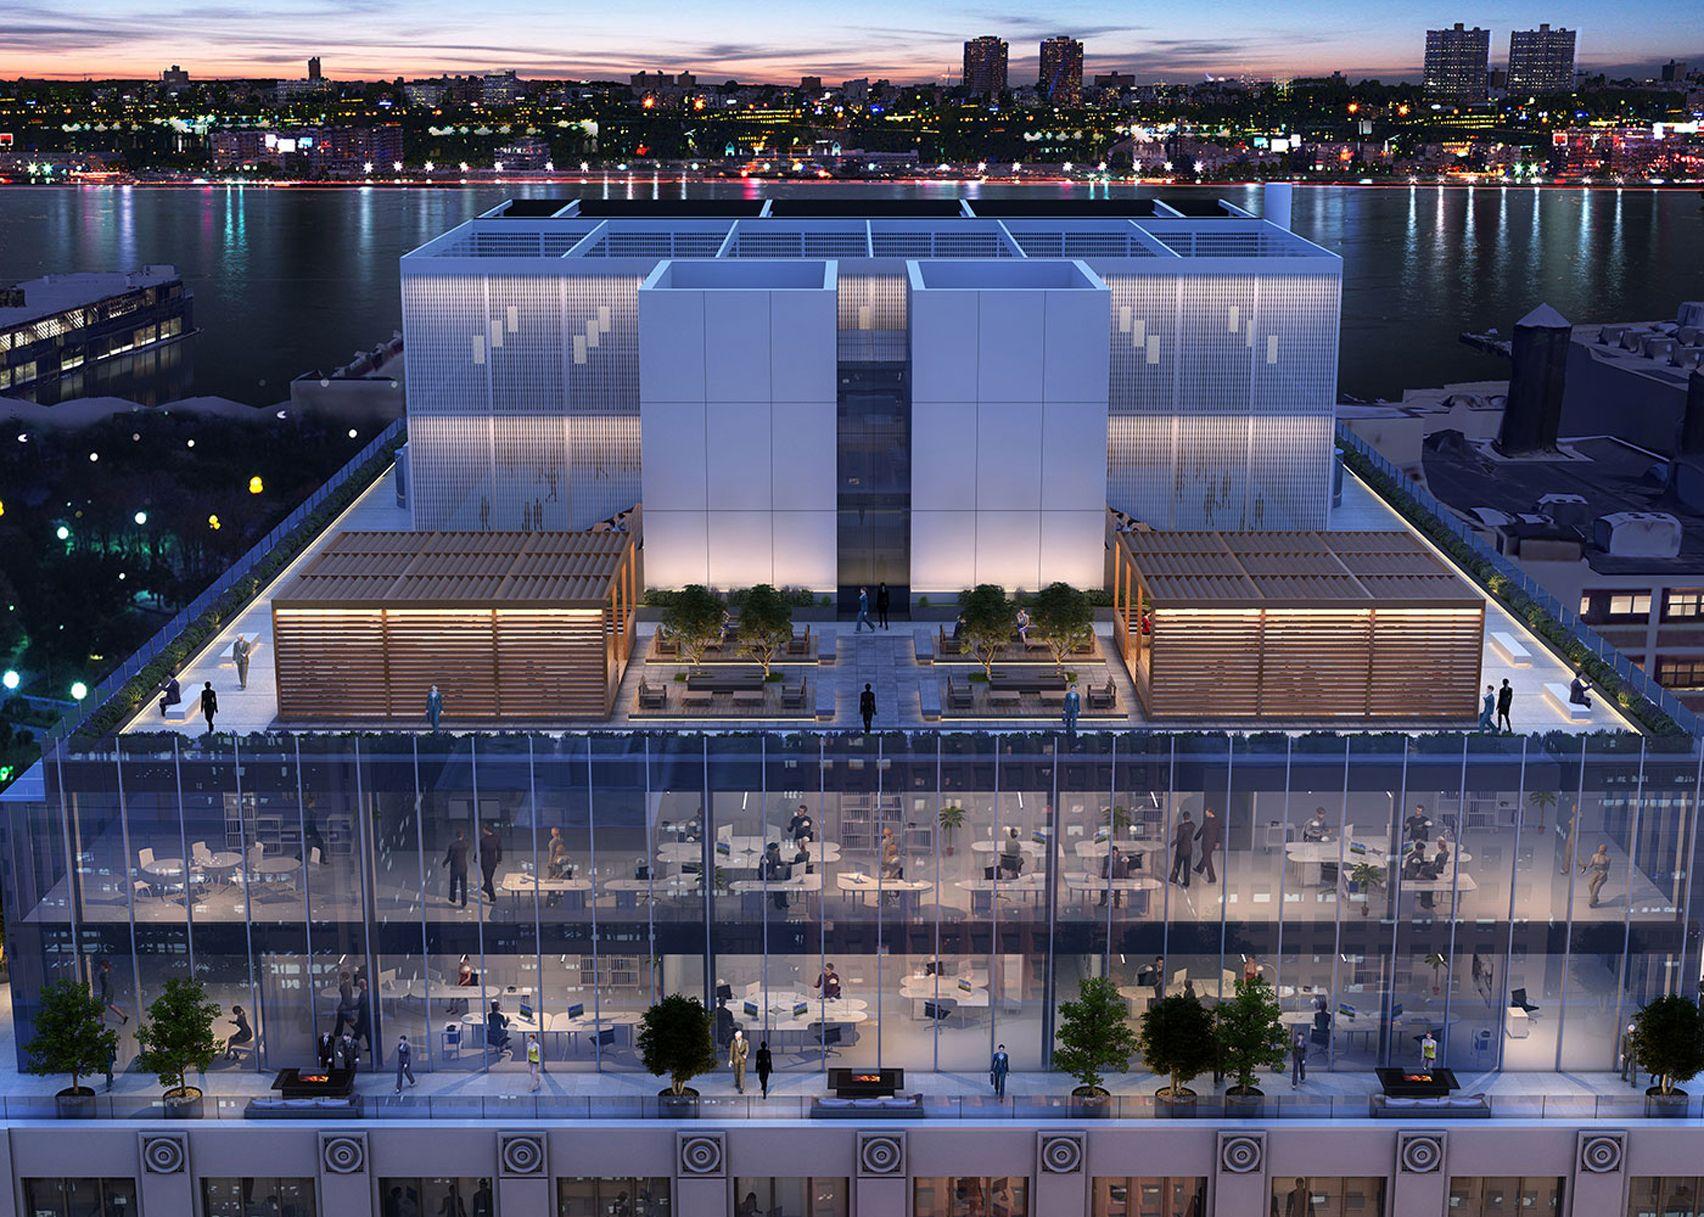 Uruguayan Architect Rafael Vi Oly Has Revealed Plans To Add